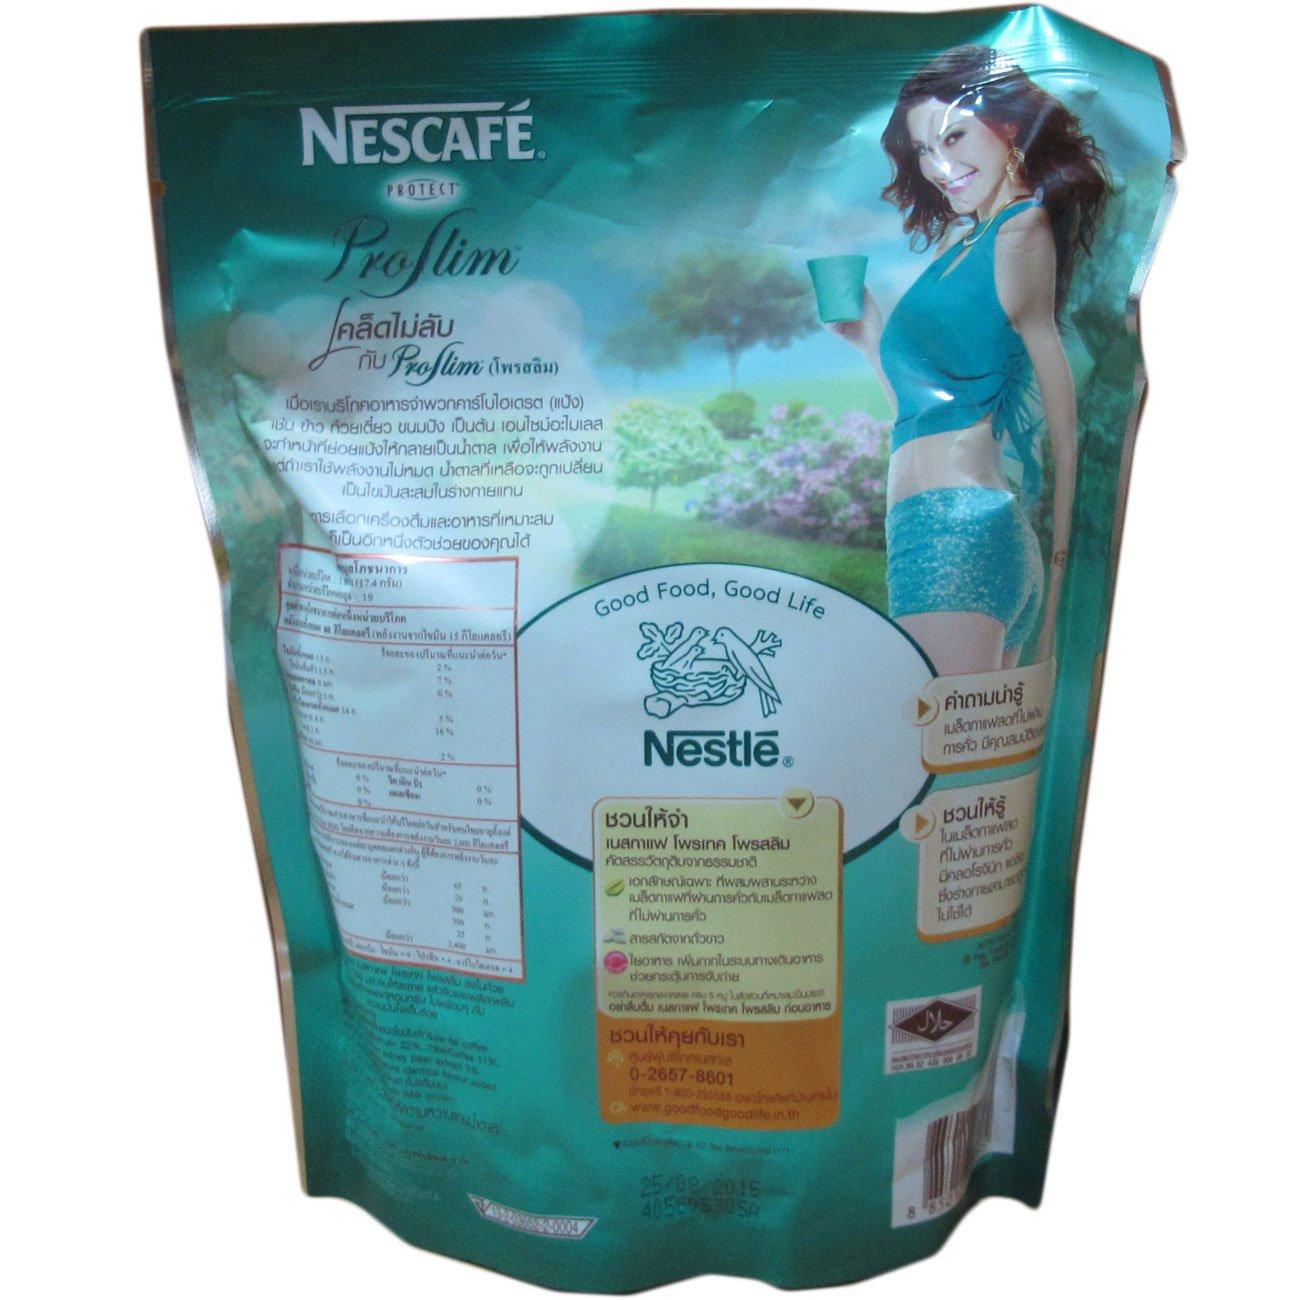 3 X Nescafe Protect Proslim Pro Slim Diet Slimming Weight Control Coffee 10 Sticks by NISAKORN